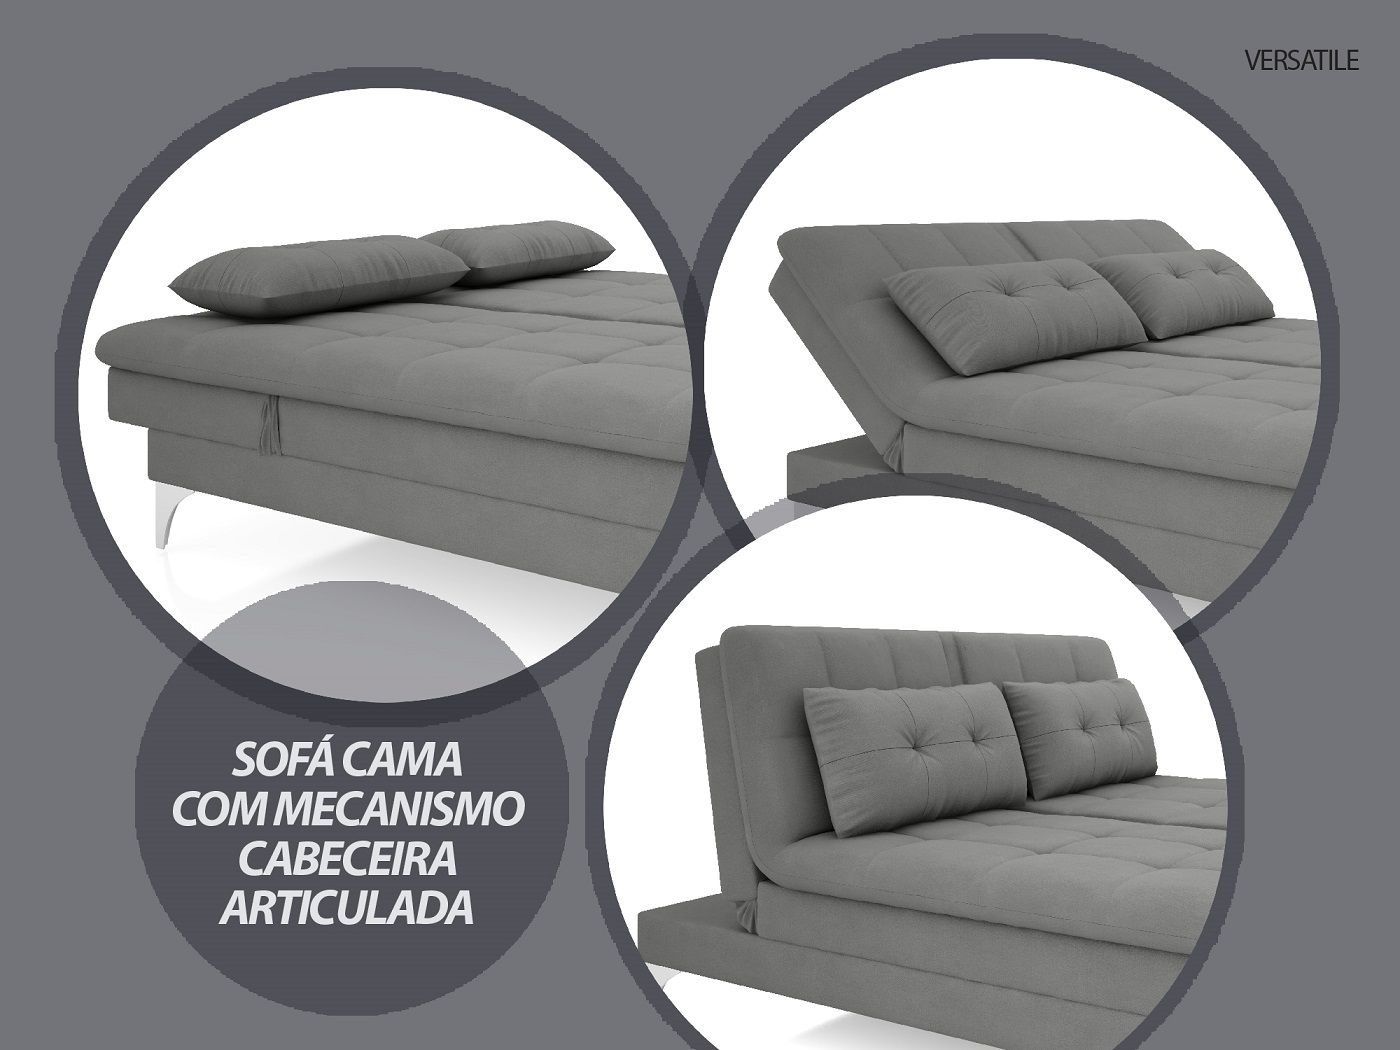 Sofá-Cama Casal New Versatile 1,94m Velosuede Grafite - NETSOFAS  - NETSOFÁS